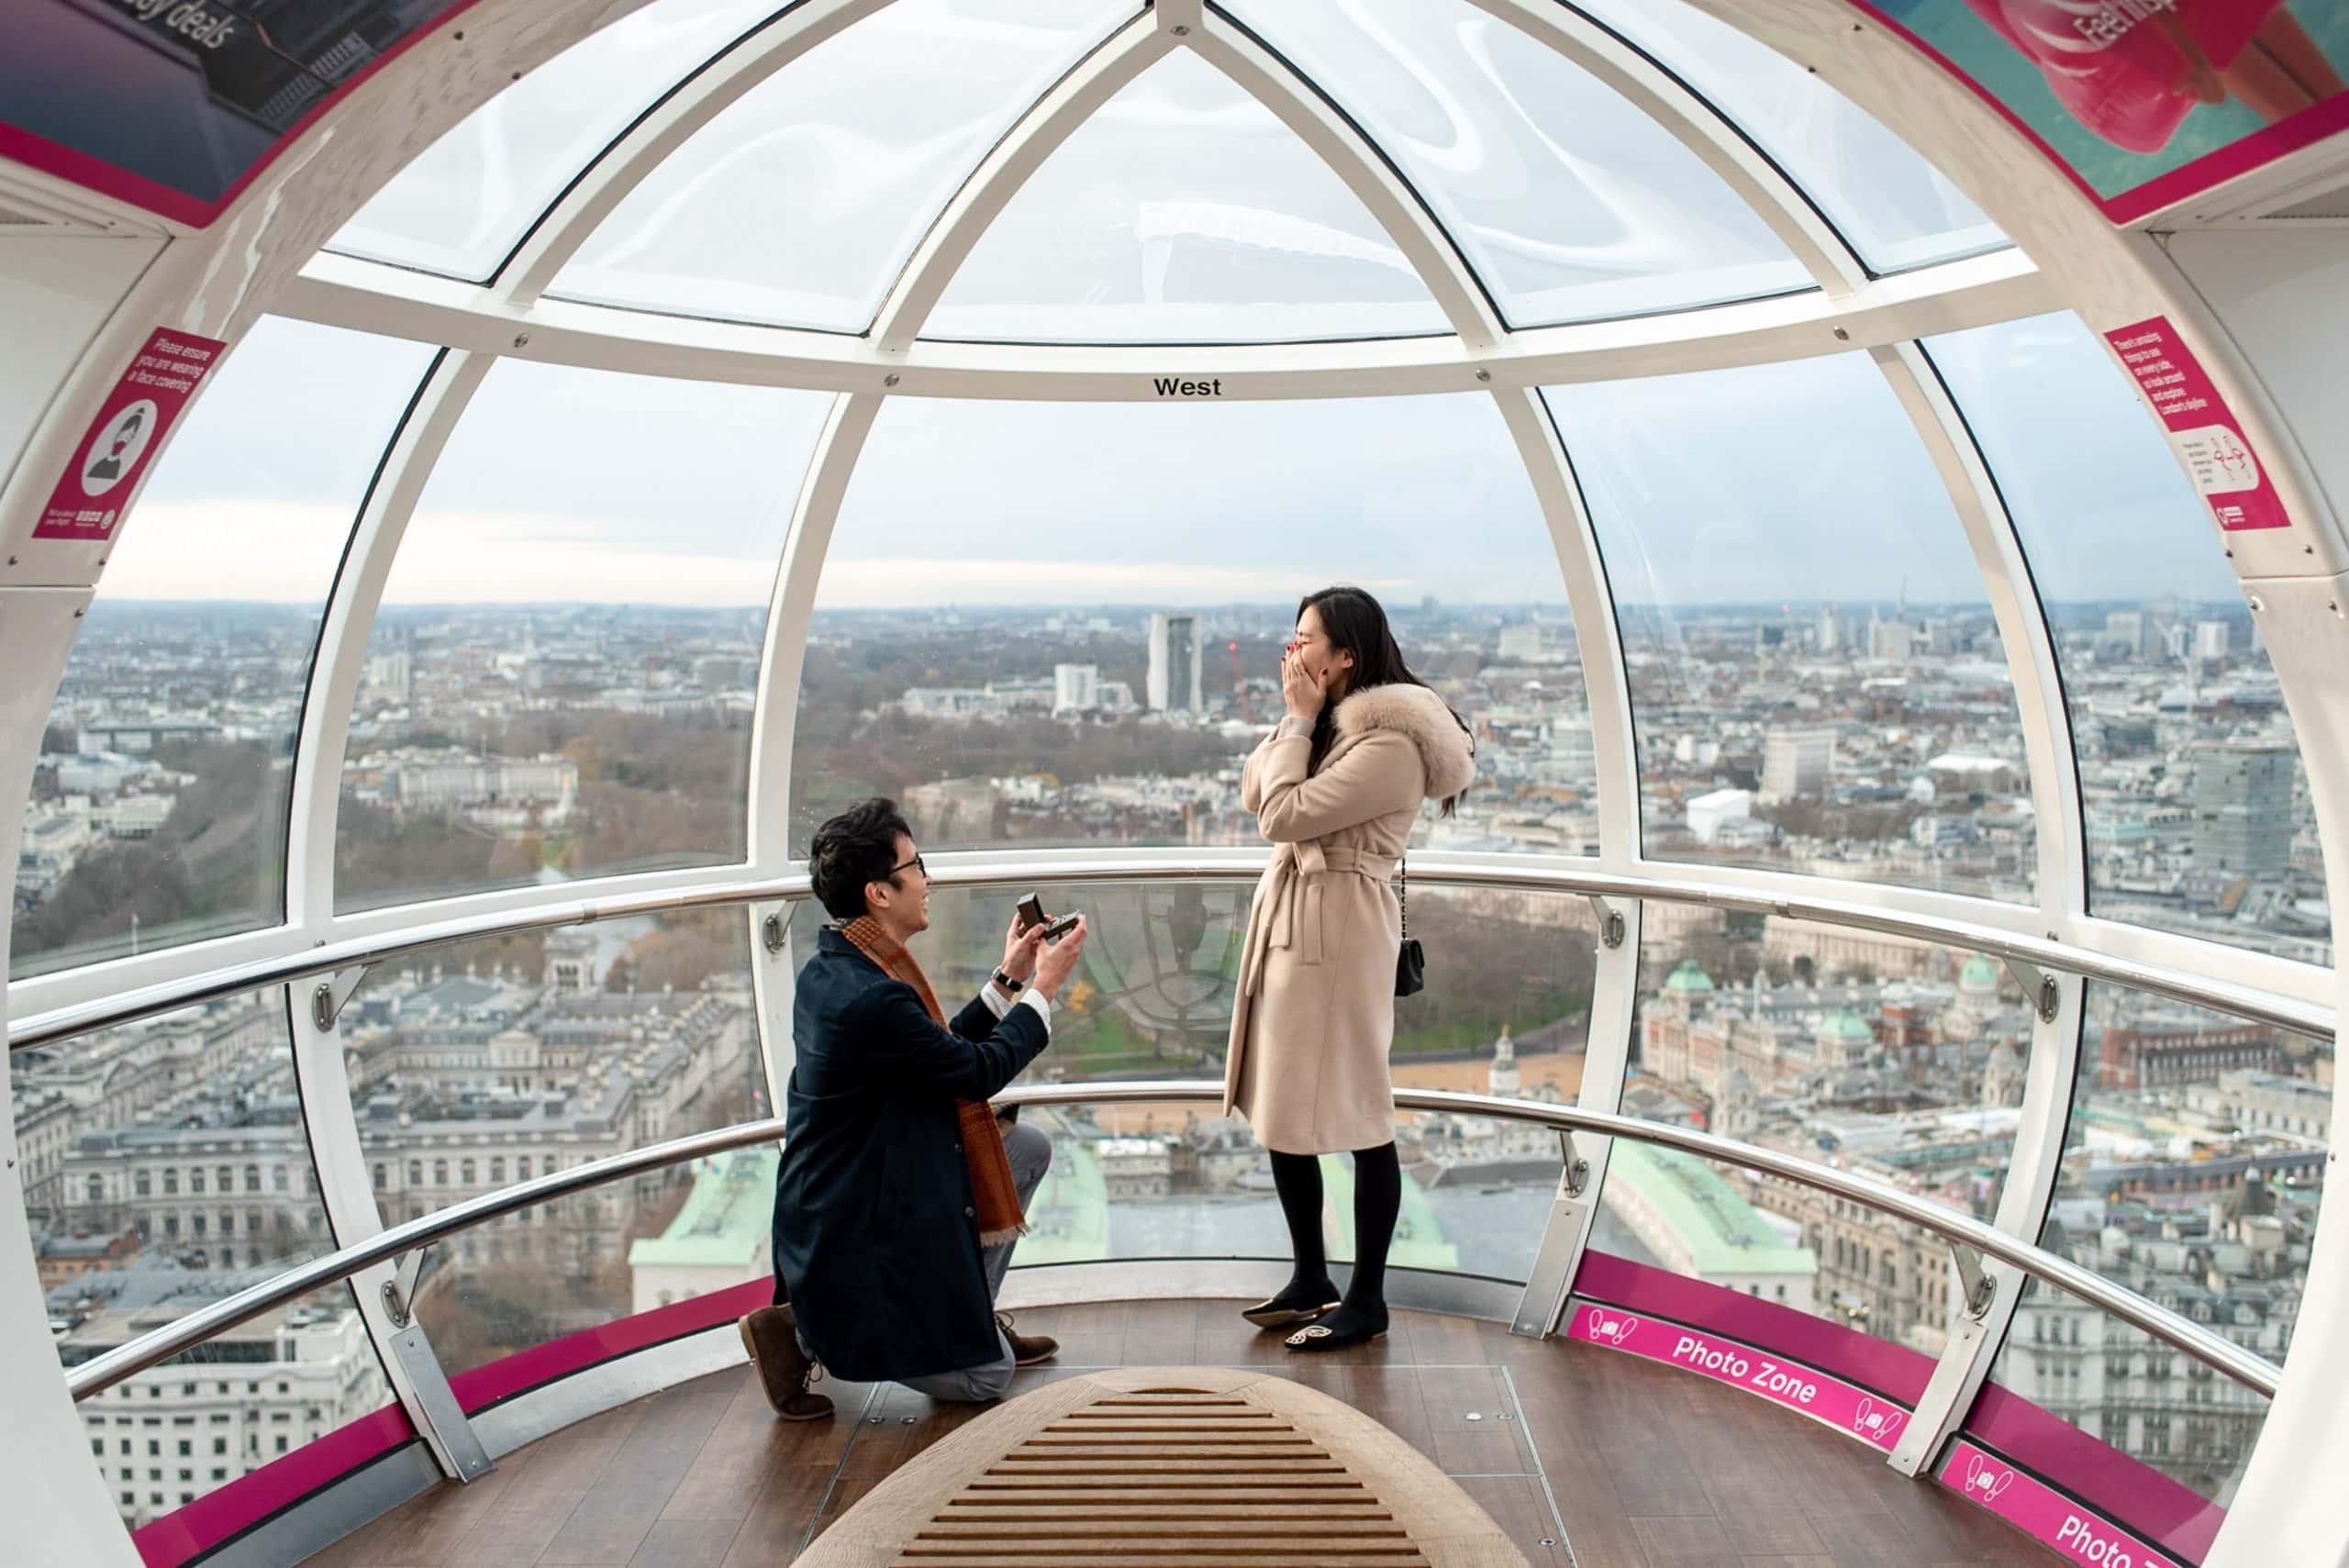 Man asking his girlfriend to marry him taken by London proposal photographer Matt Badenoch